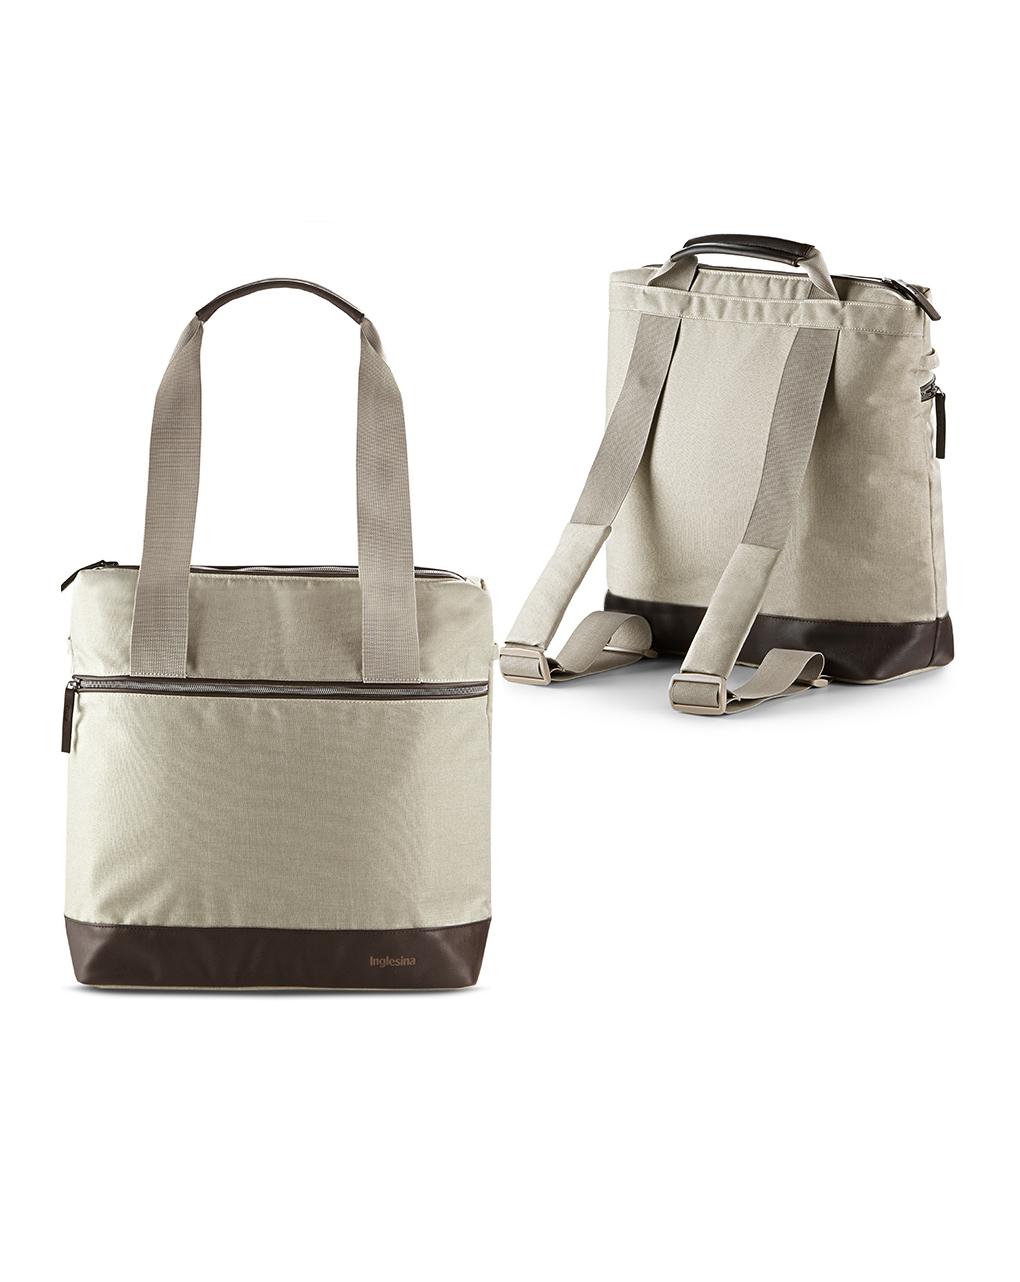 Inglesina aptica back bag, cashmere beige - Inglesina